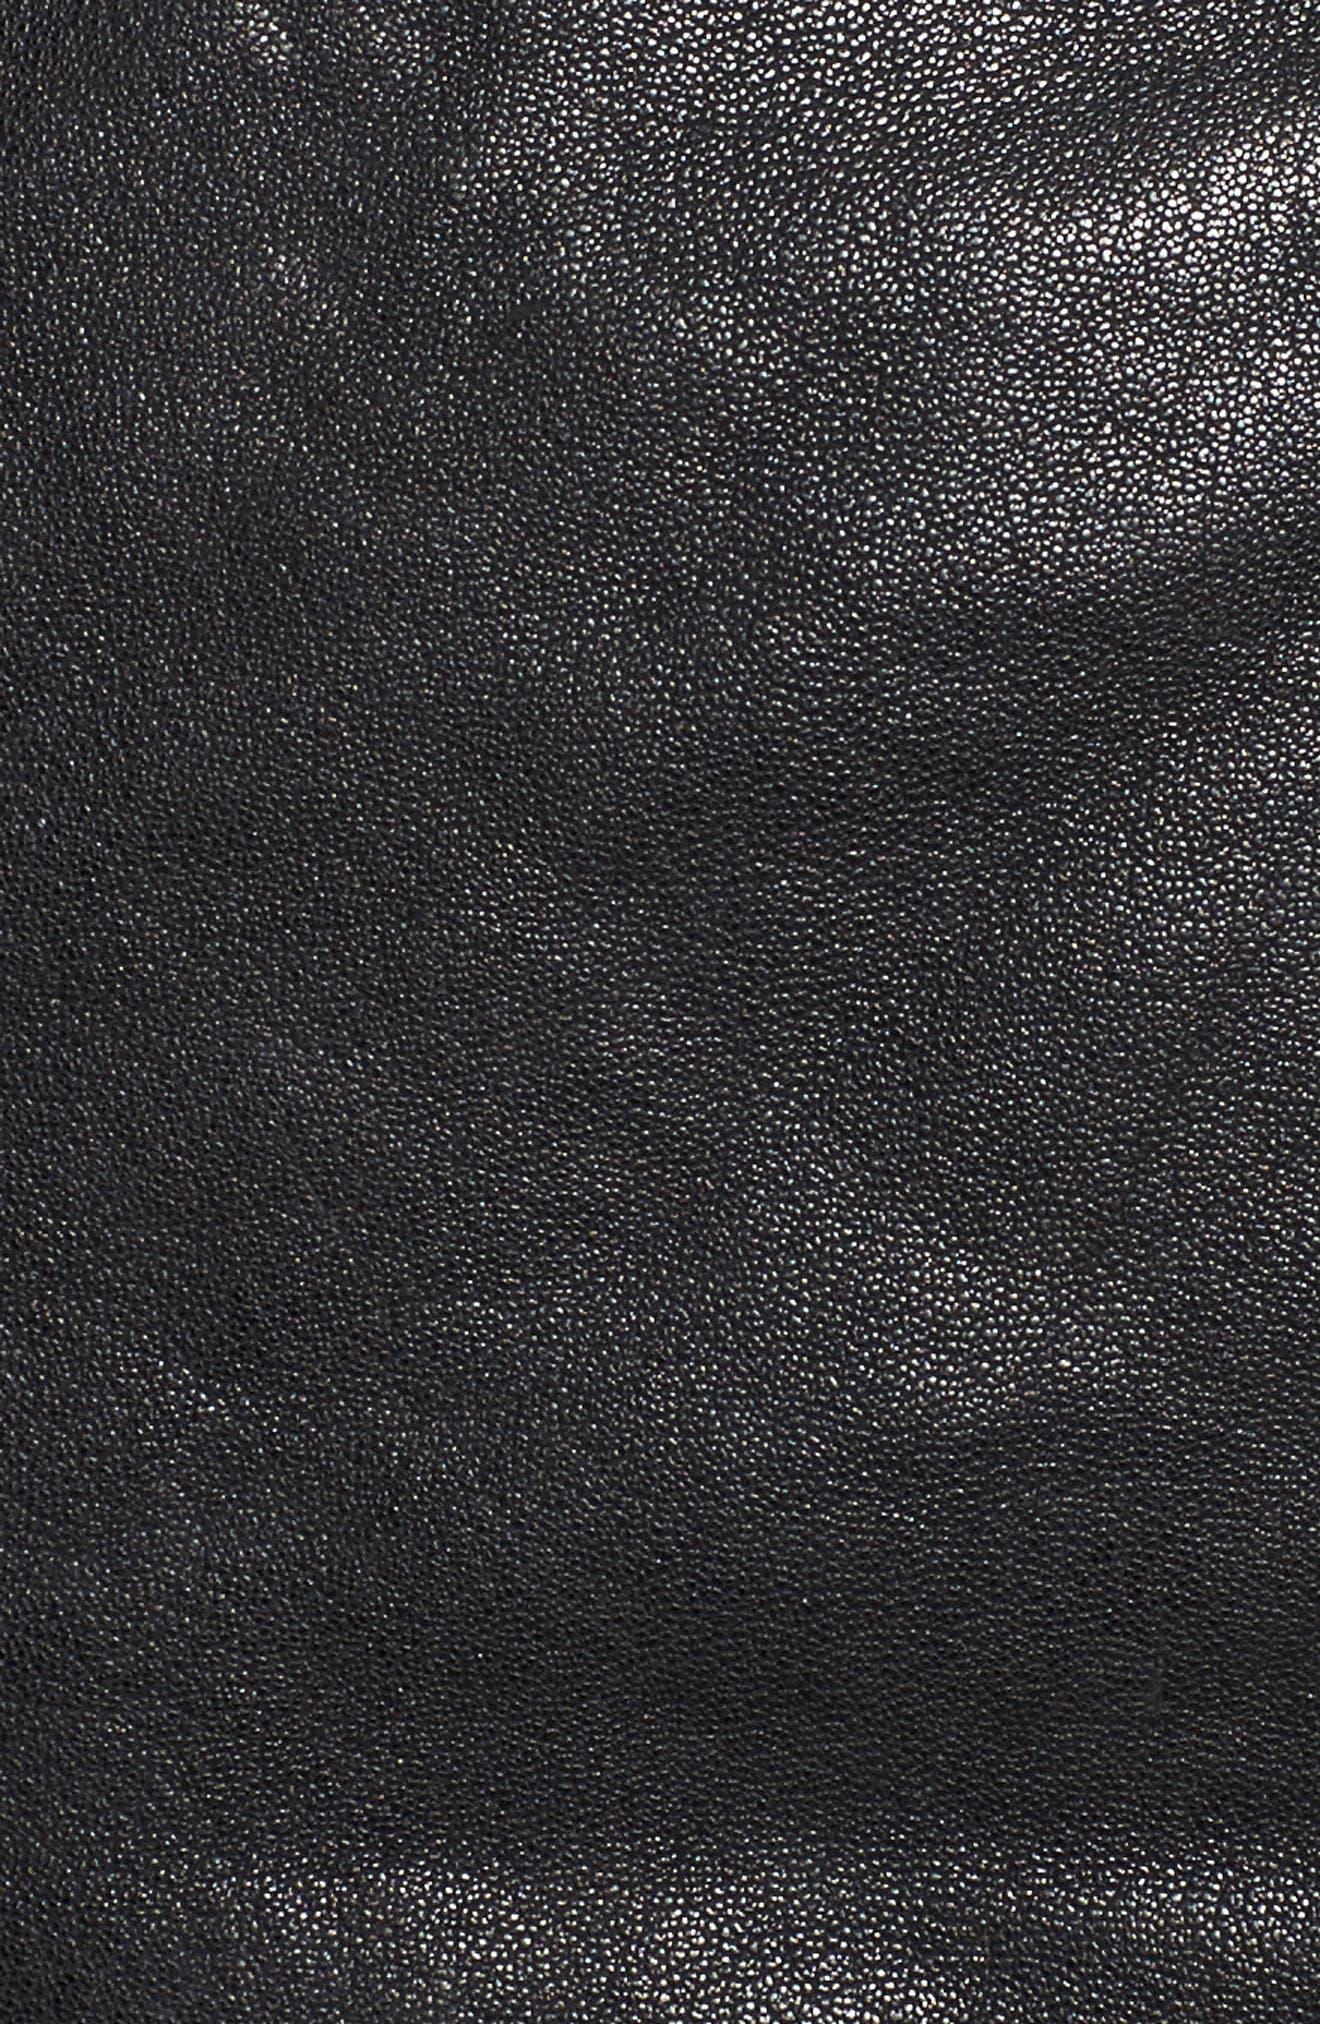 Washed Leather Crop Moto Jacket,                             Alternate thumbnail 5, color,                             001